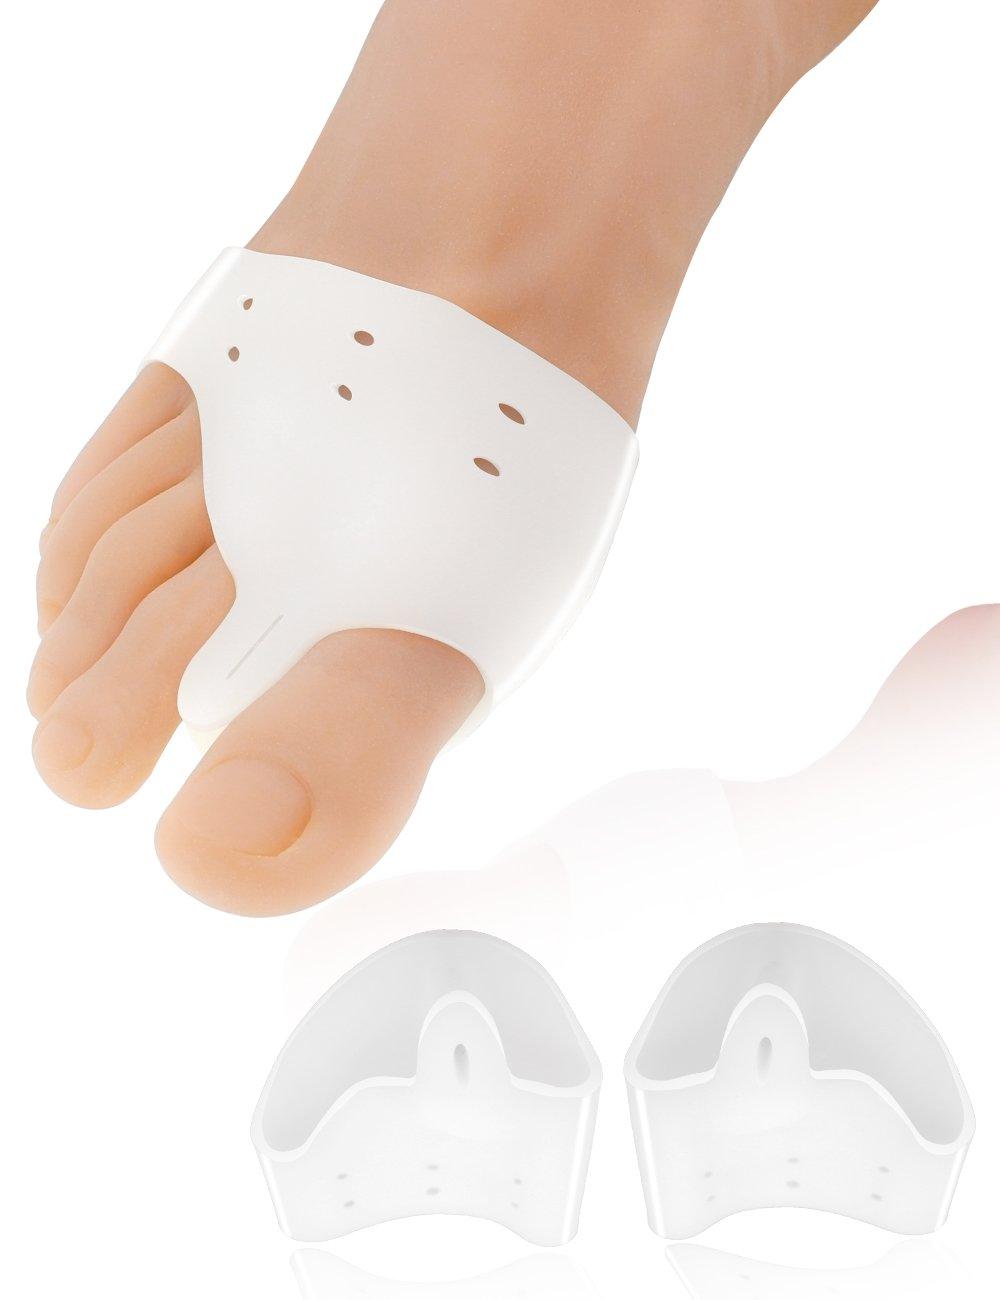 Toe Glow Bunion Corrector 2pcs Gel Bunion Pads Splint Protector Sleeves kit Toe Pain Hallux Valgus Relief Big Toe Spacers for Women & Men